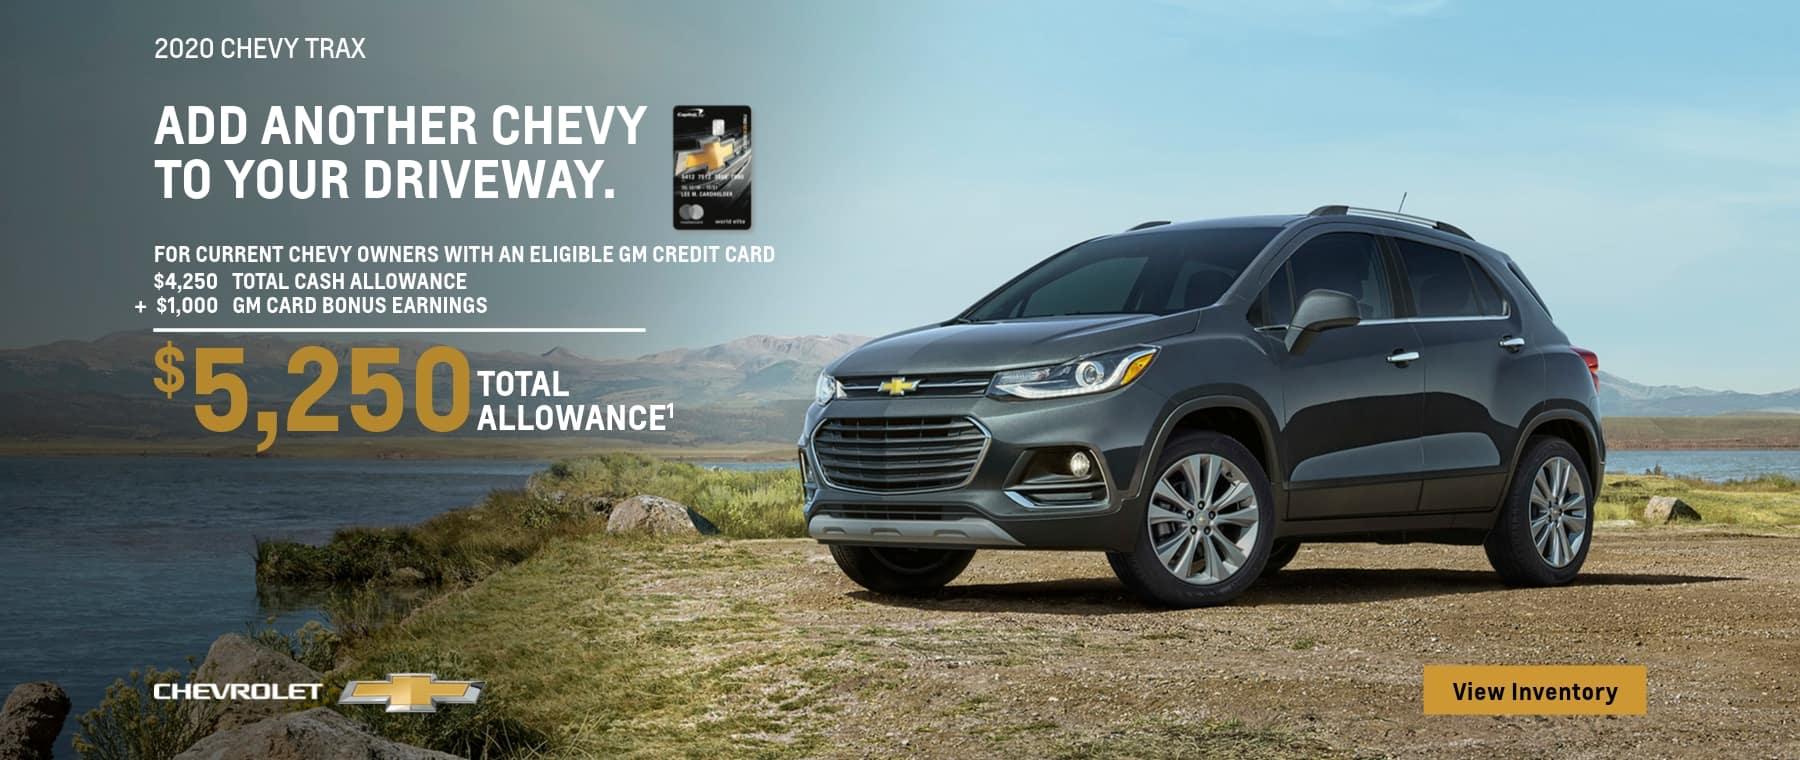 Kelebihan Kekurangan Dealer Chevrolet Murah Berkualitas